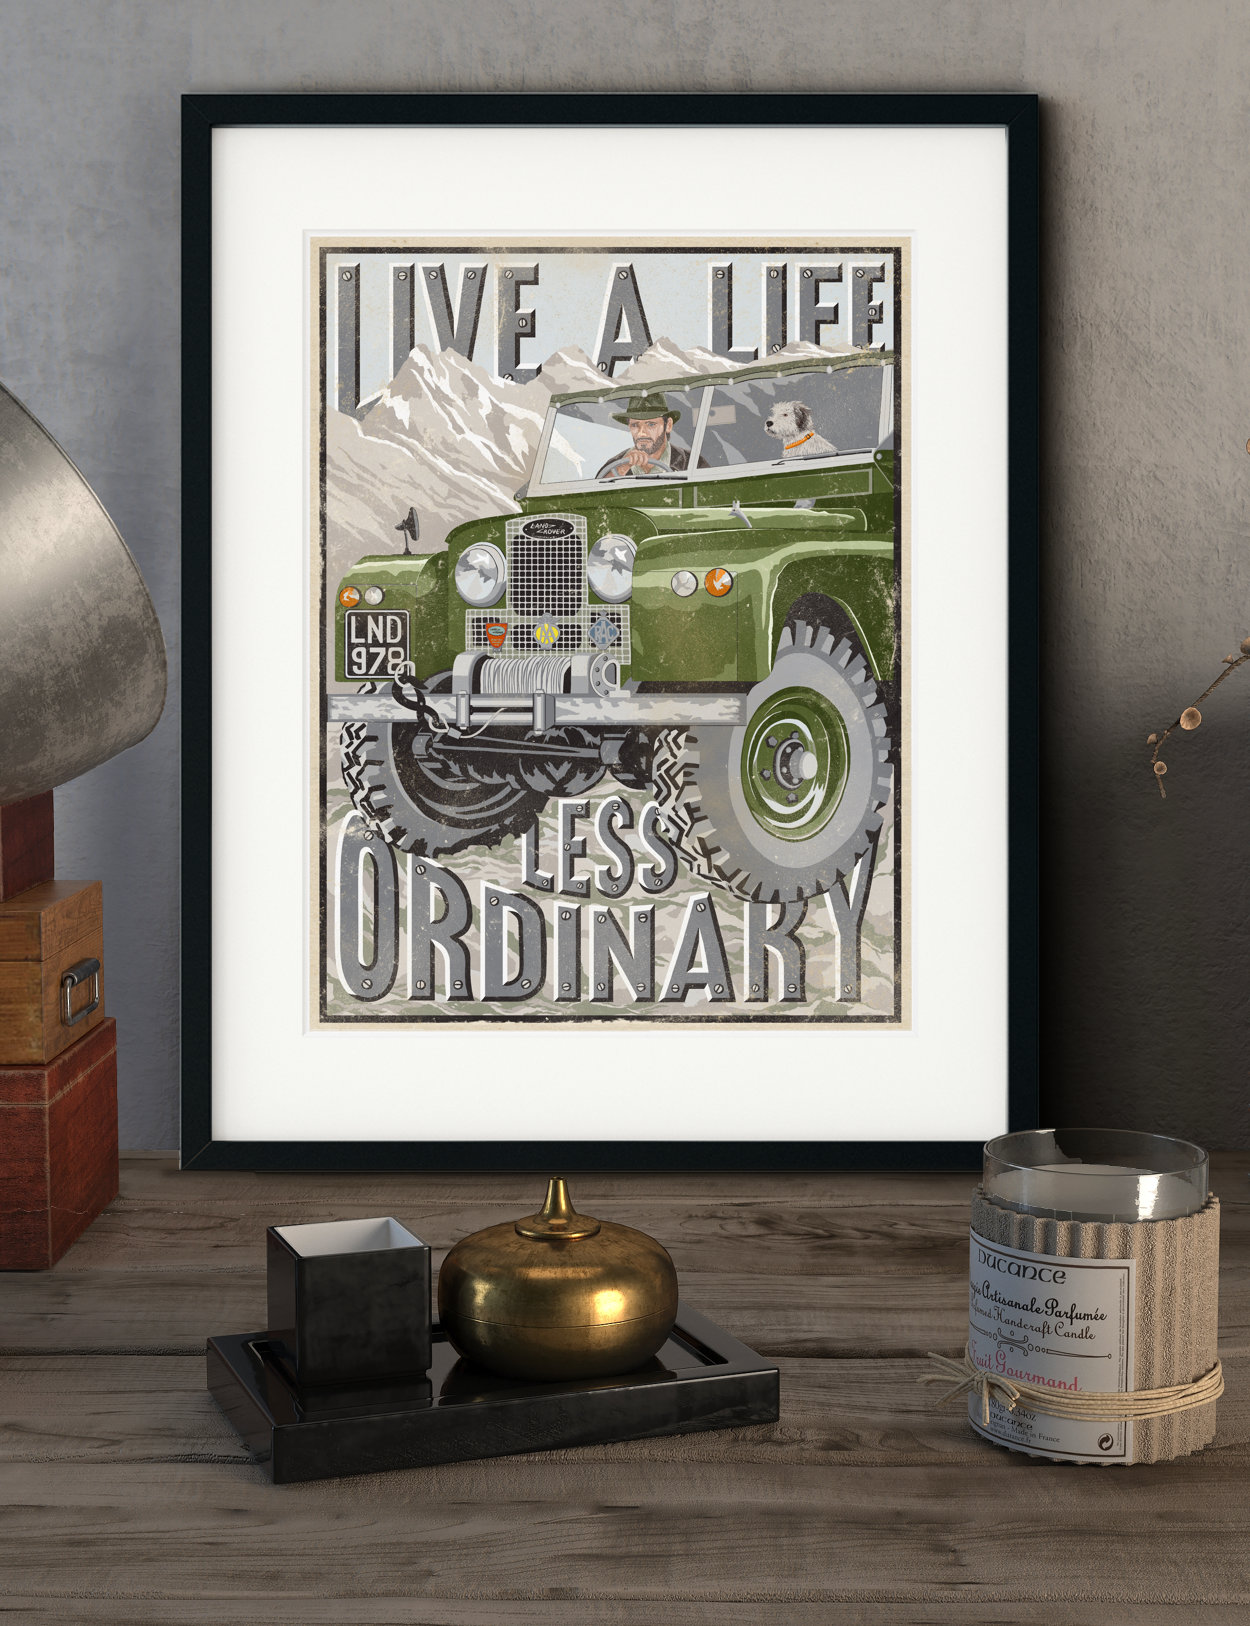 Vintage Land Rover Series Print | The Enlightened Hound